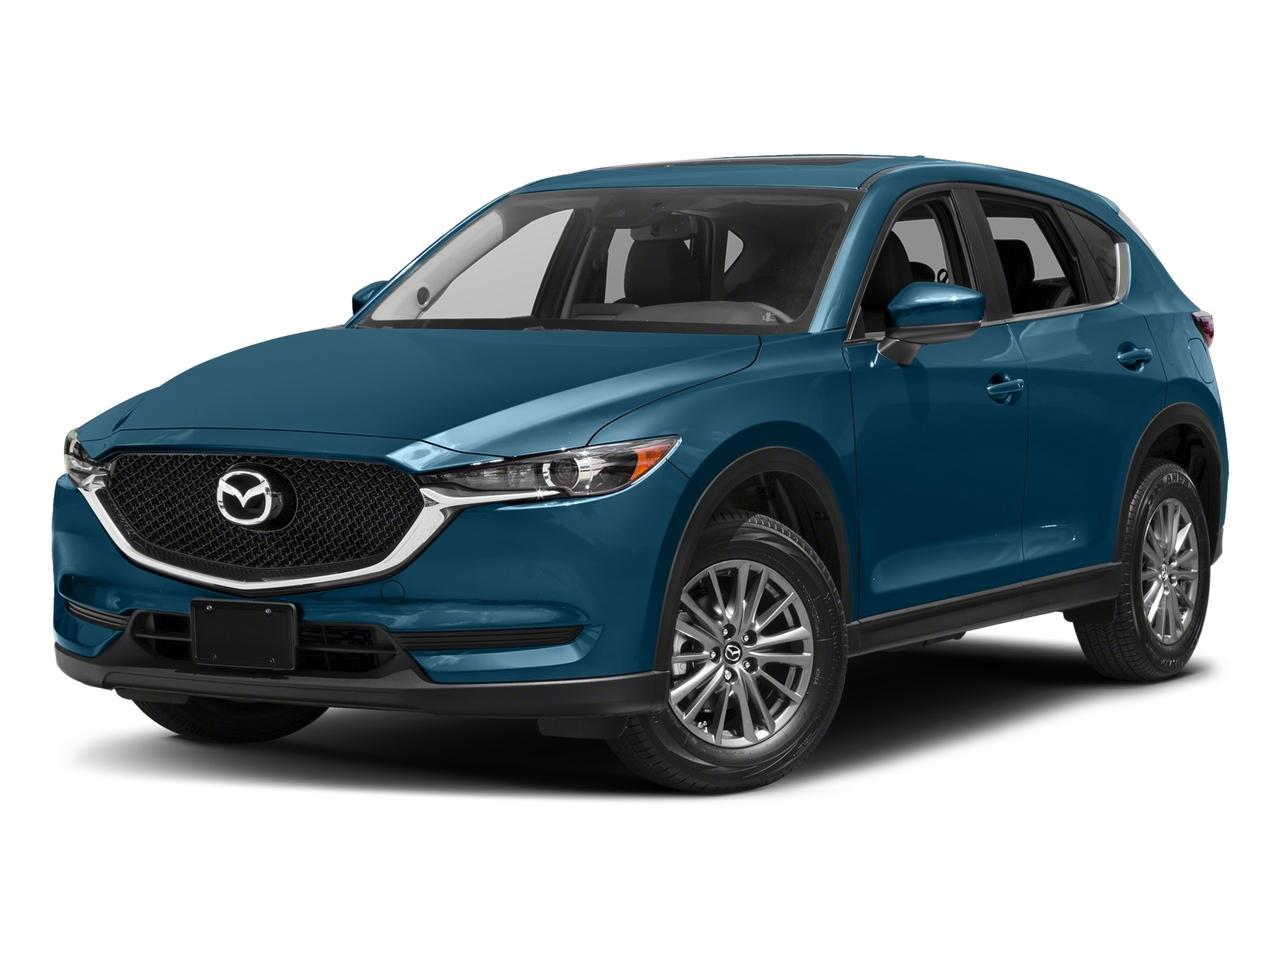 2017 Mazda CX-5 Vehicle Photo in San Angelo, TX 76901